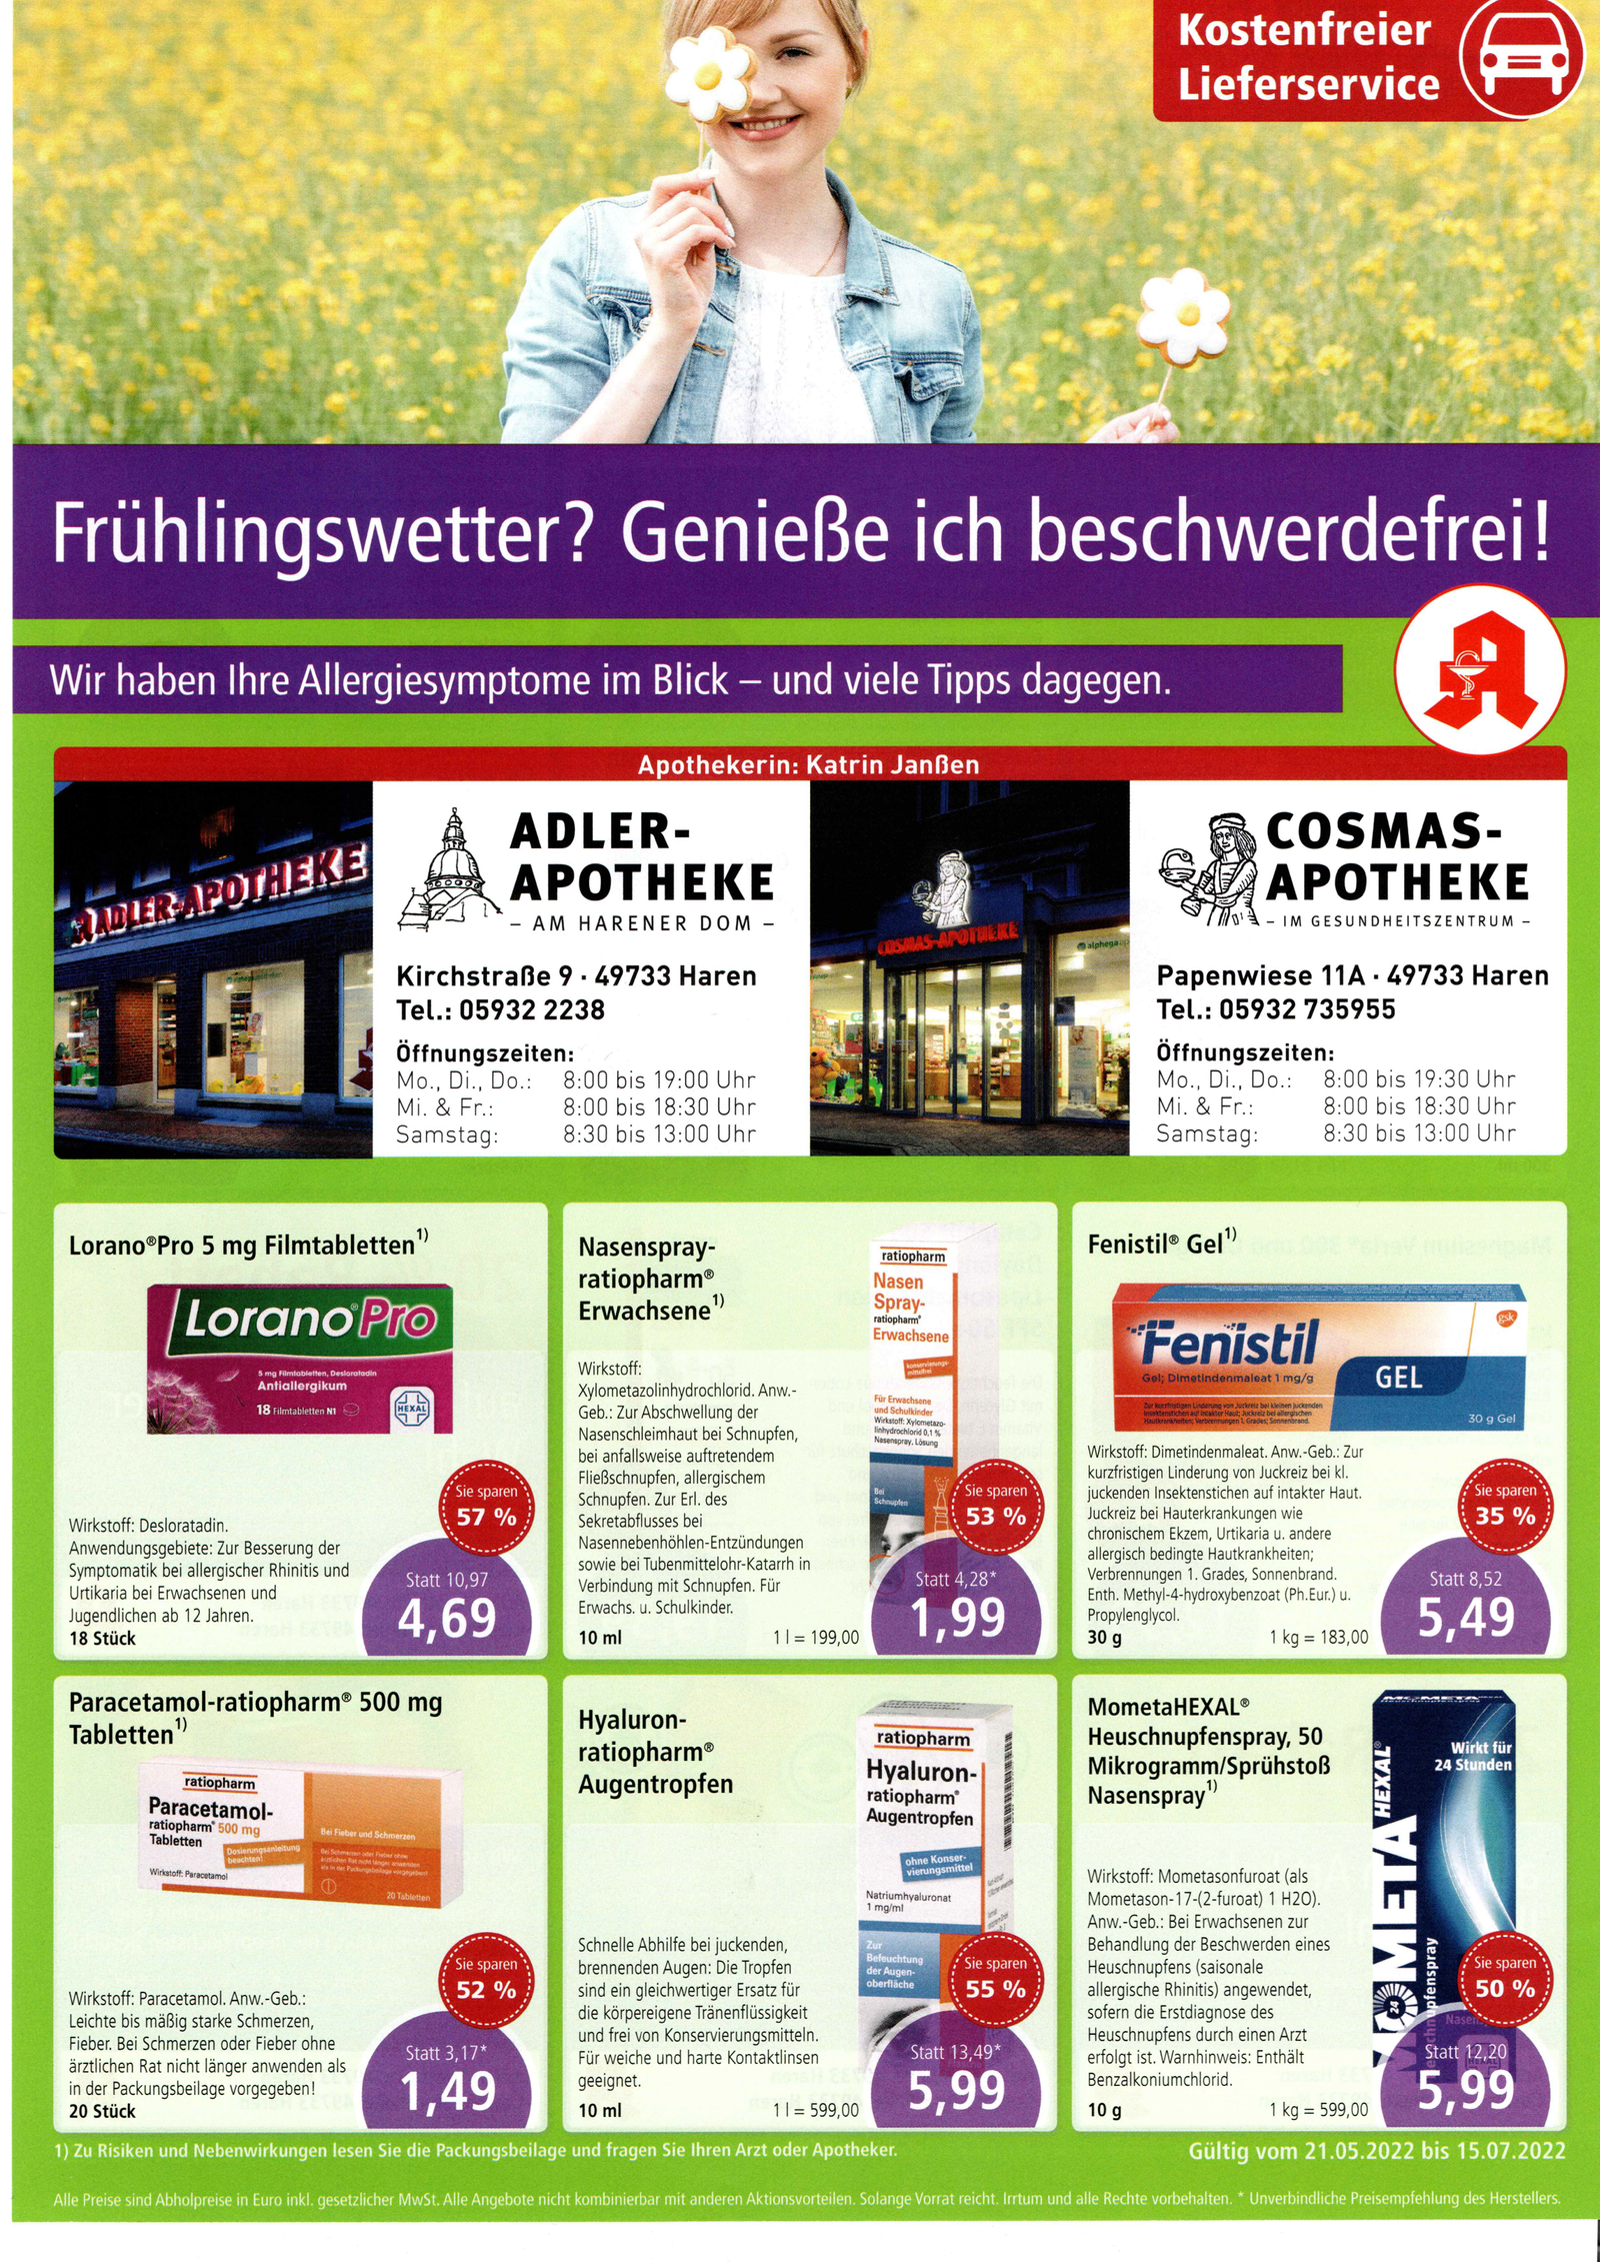 https://mein-uploads.apocdn.net/13199/leaflets/13199_flyer-Seite1.png